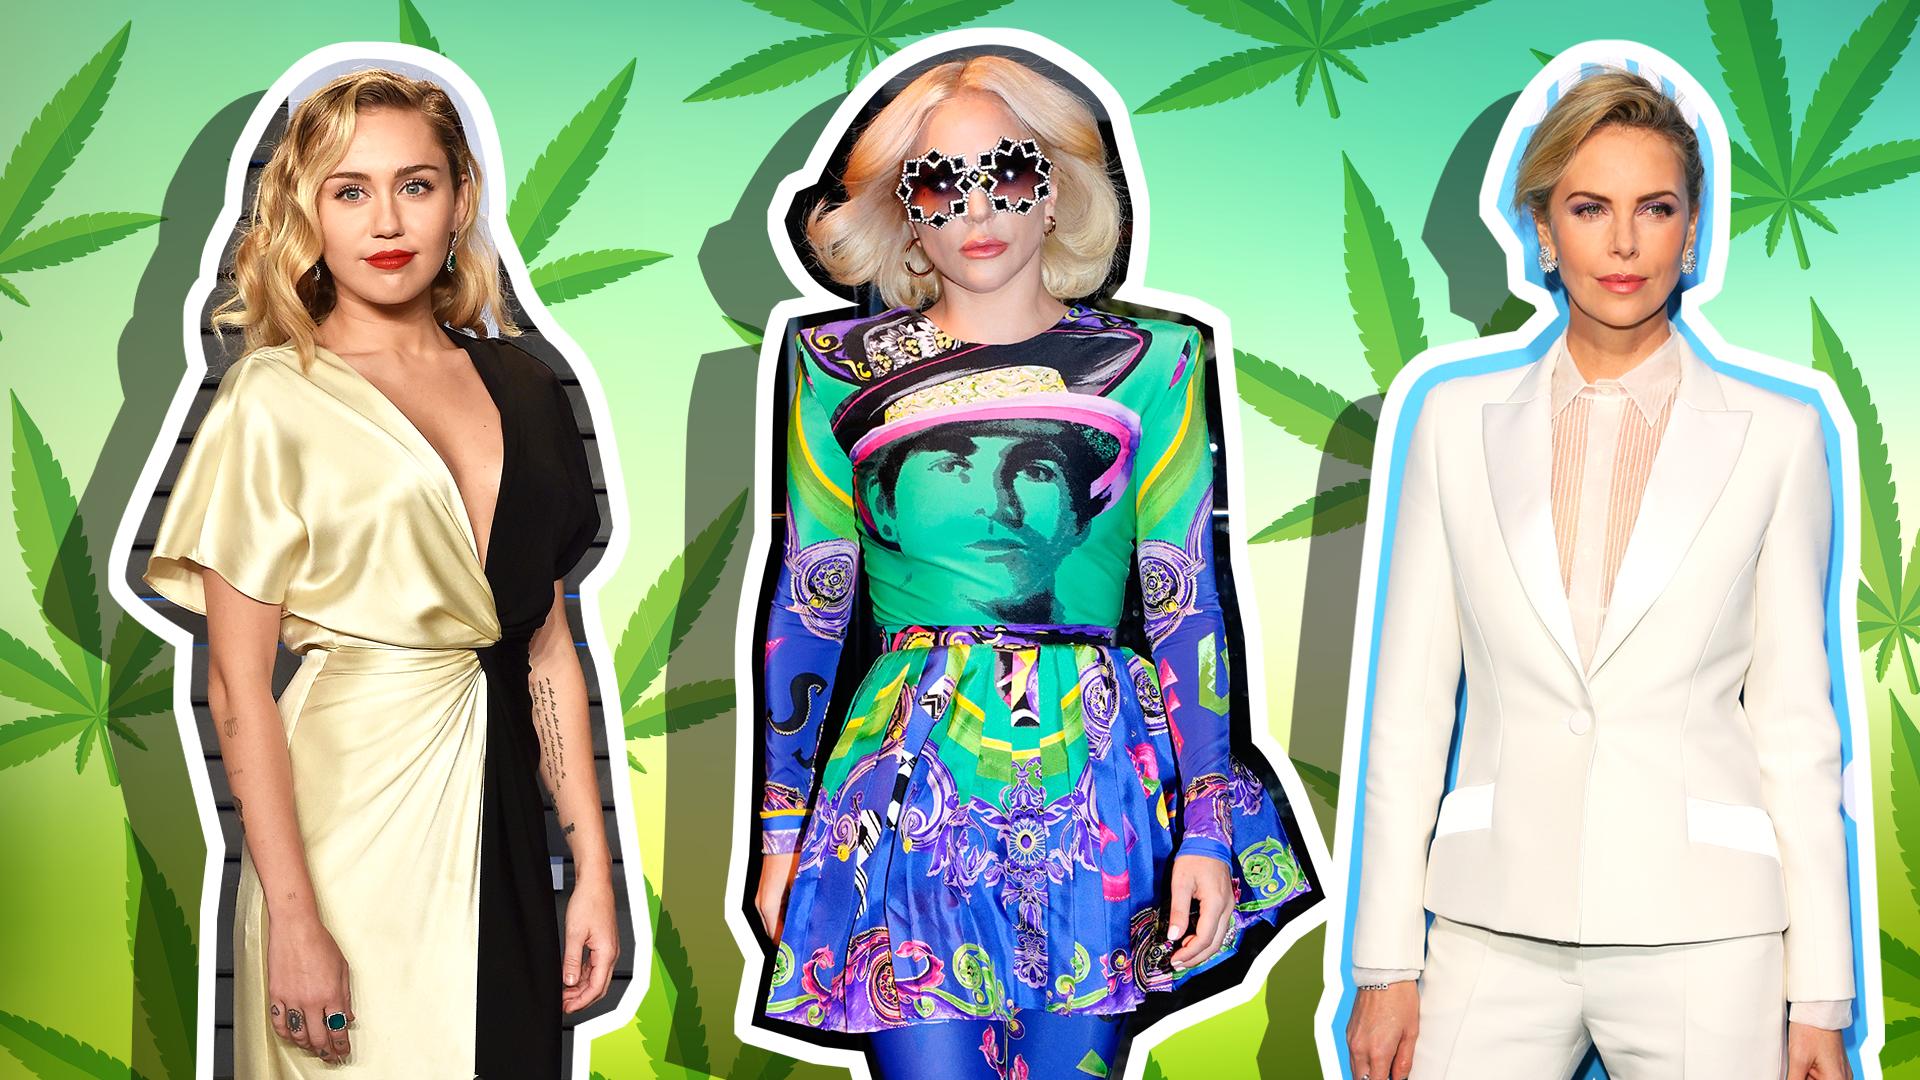 Lady Gaga, Miley Cyrus, Charlize Theron